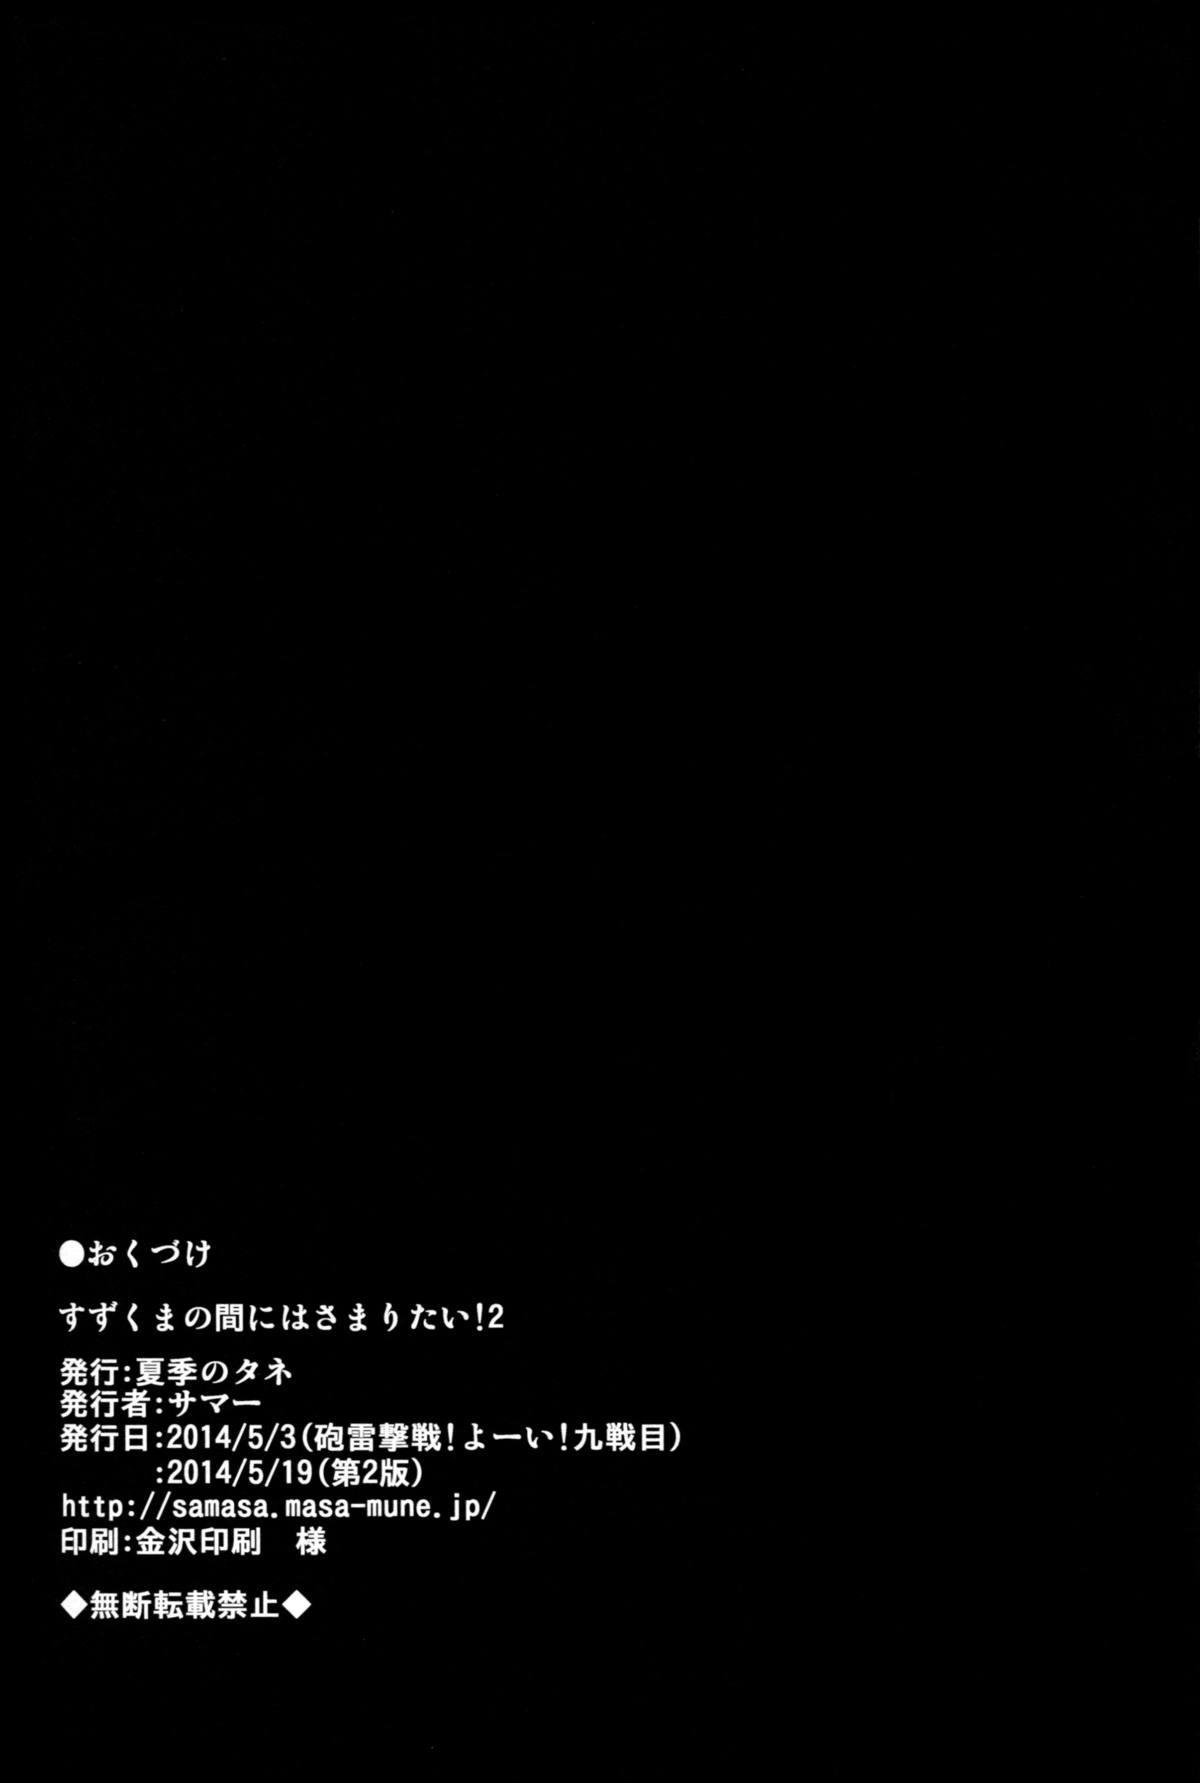 Suzu Kuma no Aida ni Hasamaritai! 2   I Want to be Stuck Between Suzuya and Kumano! 2 20